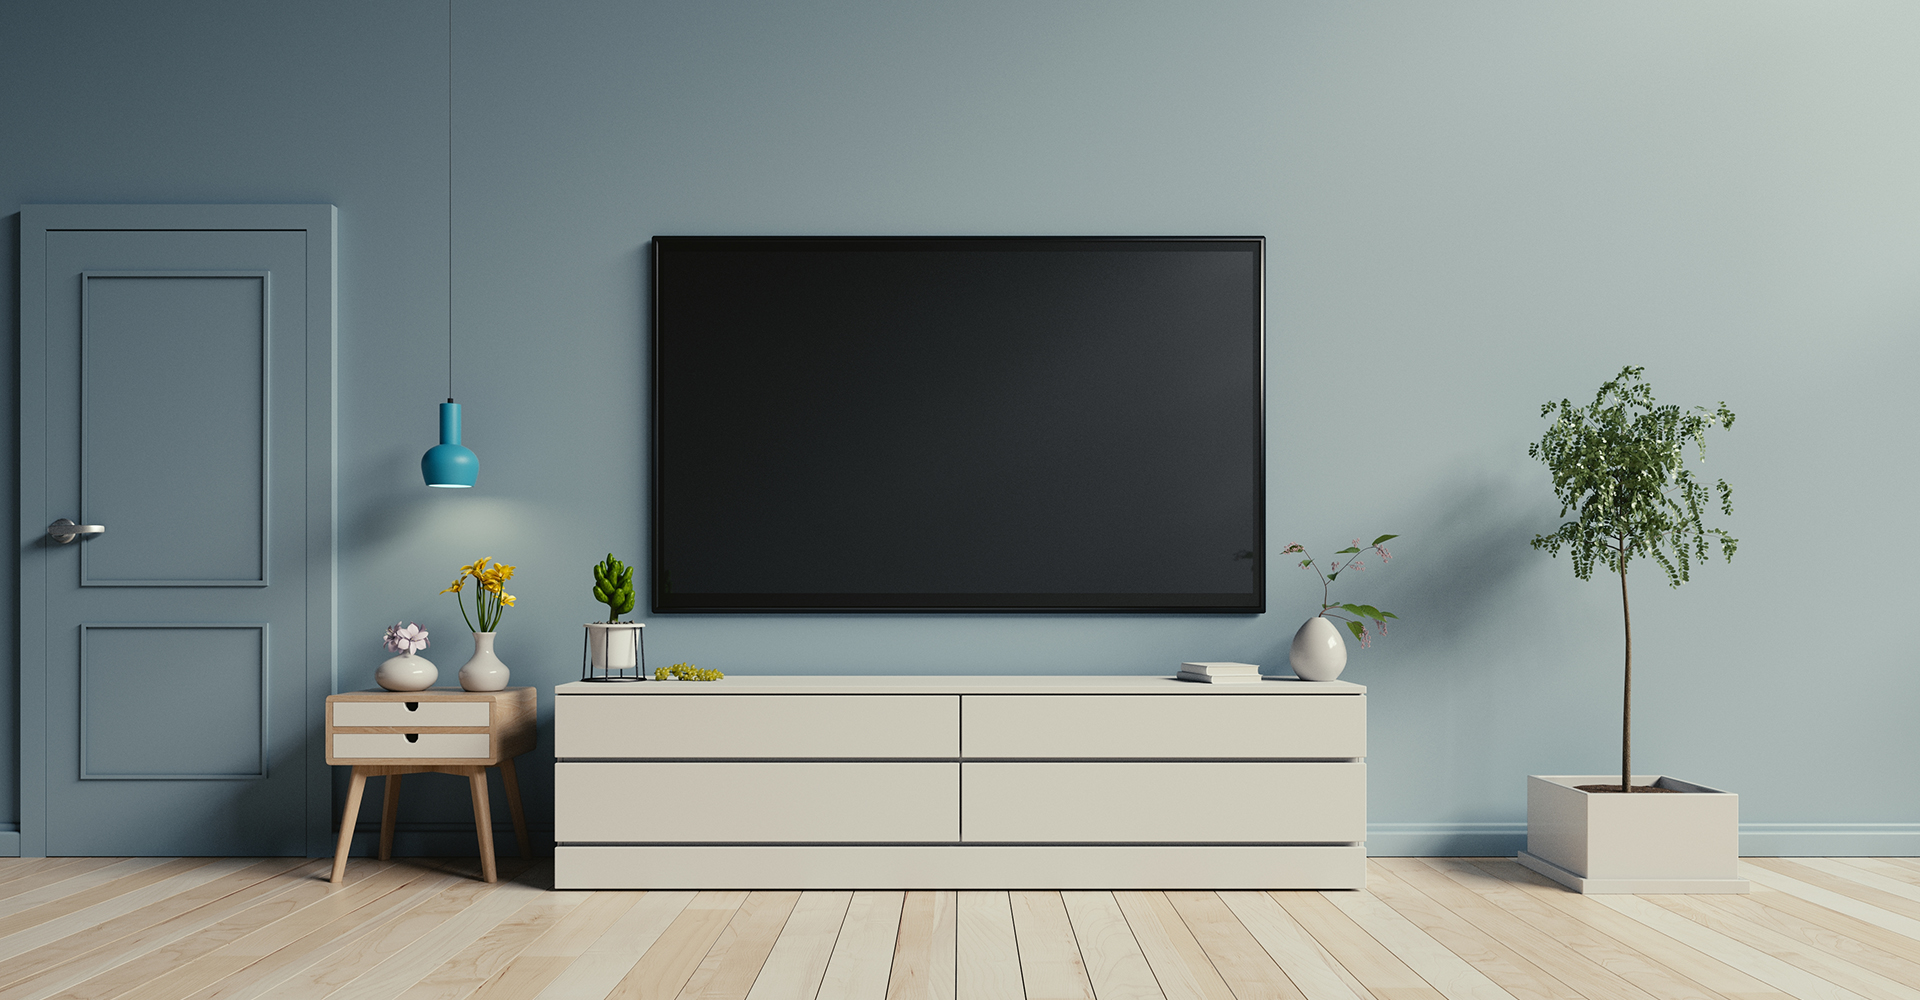 Lixvu: TV Series